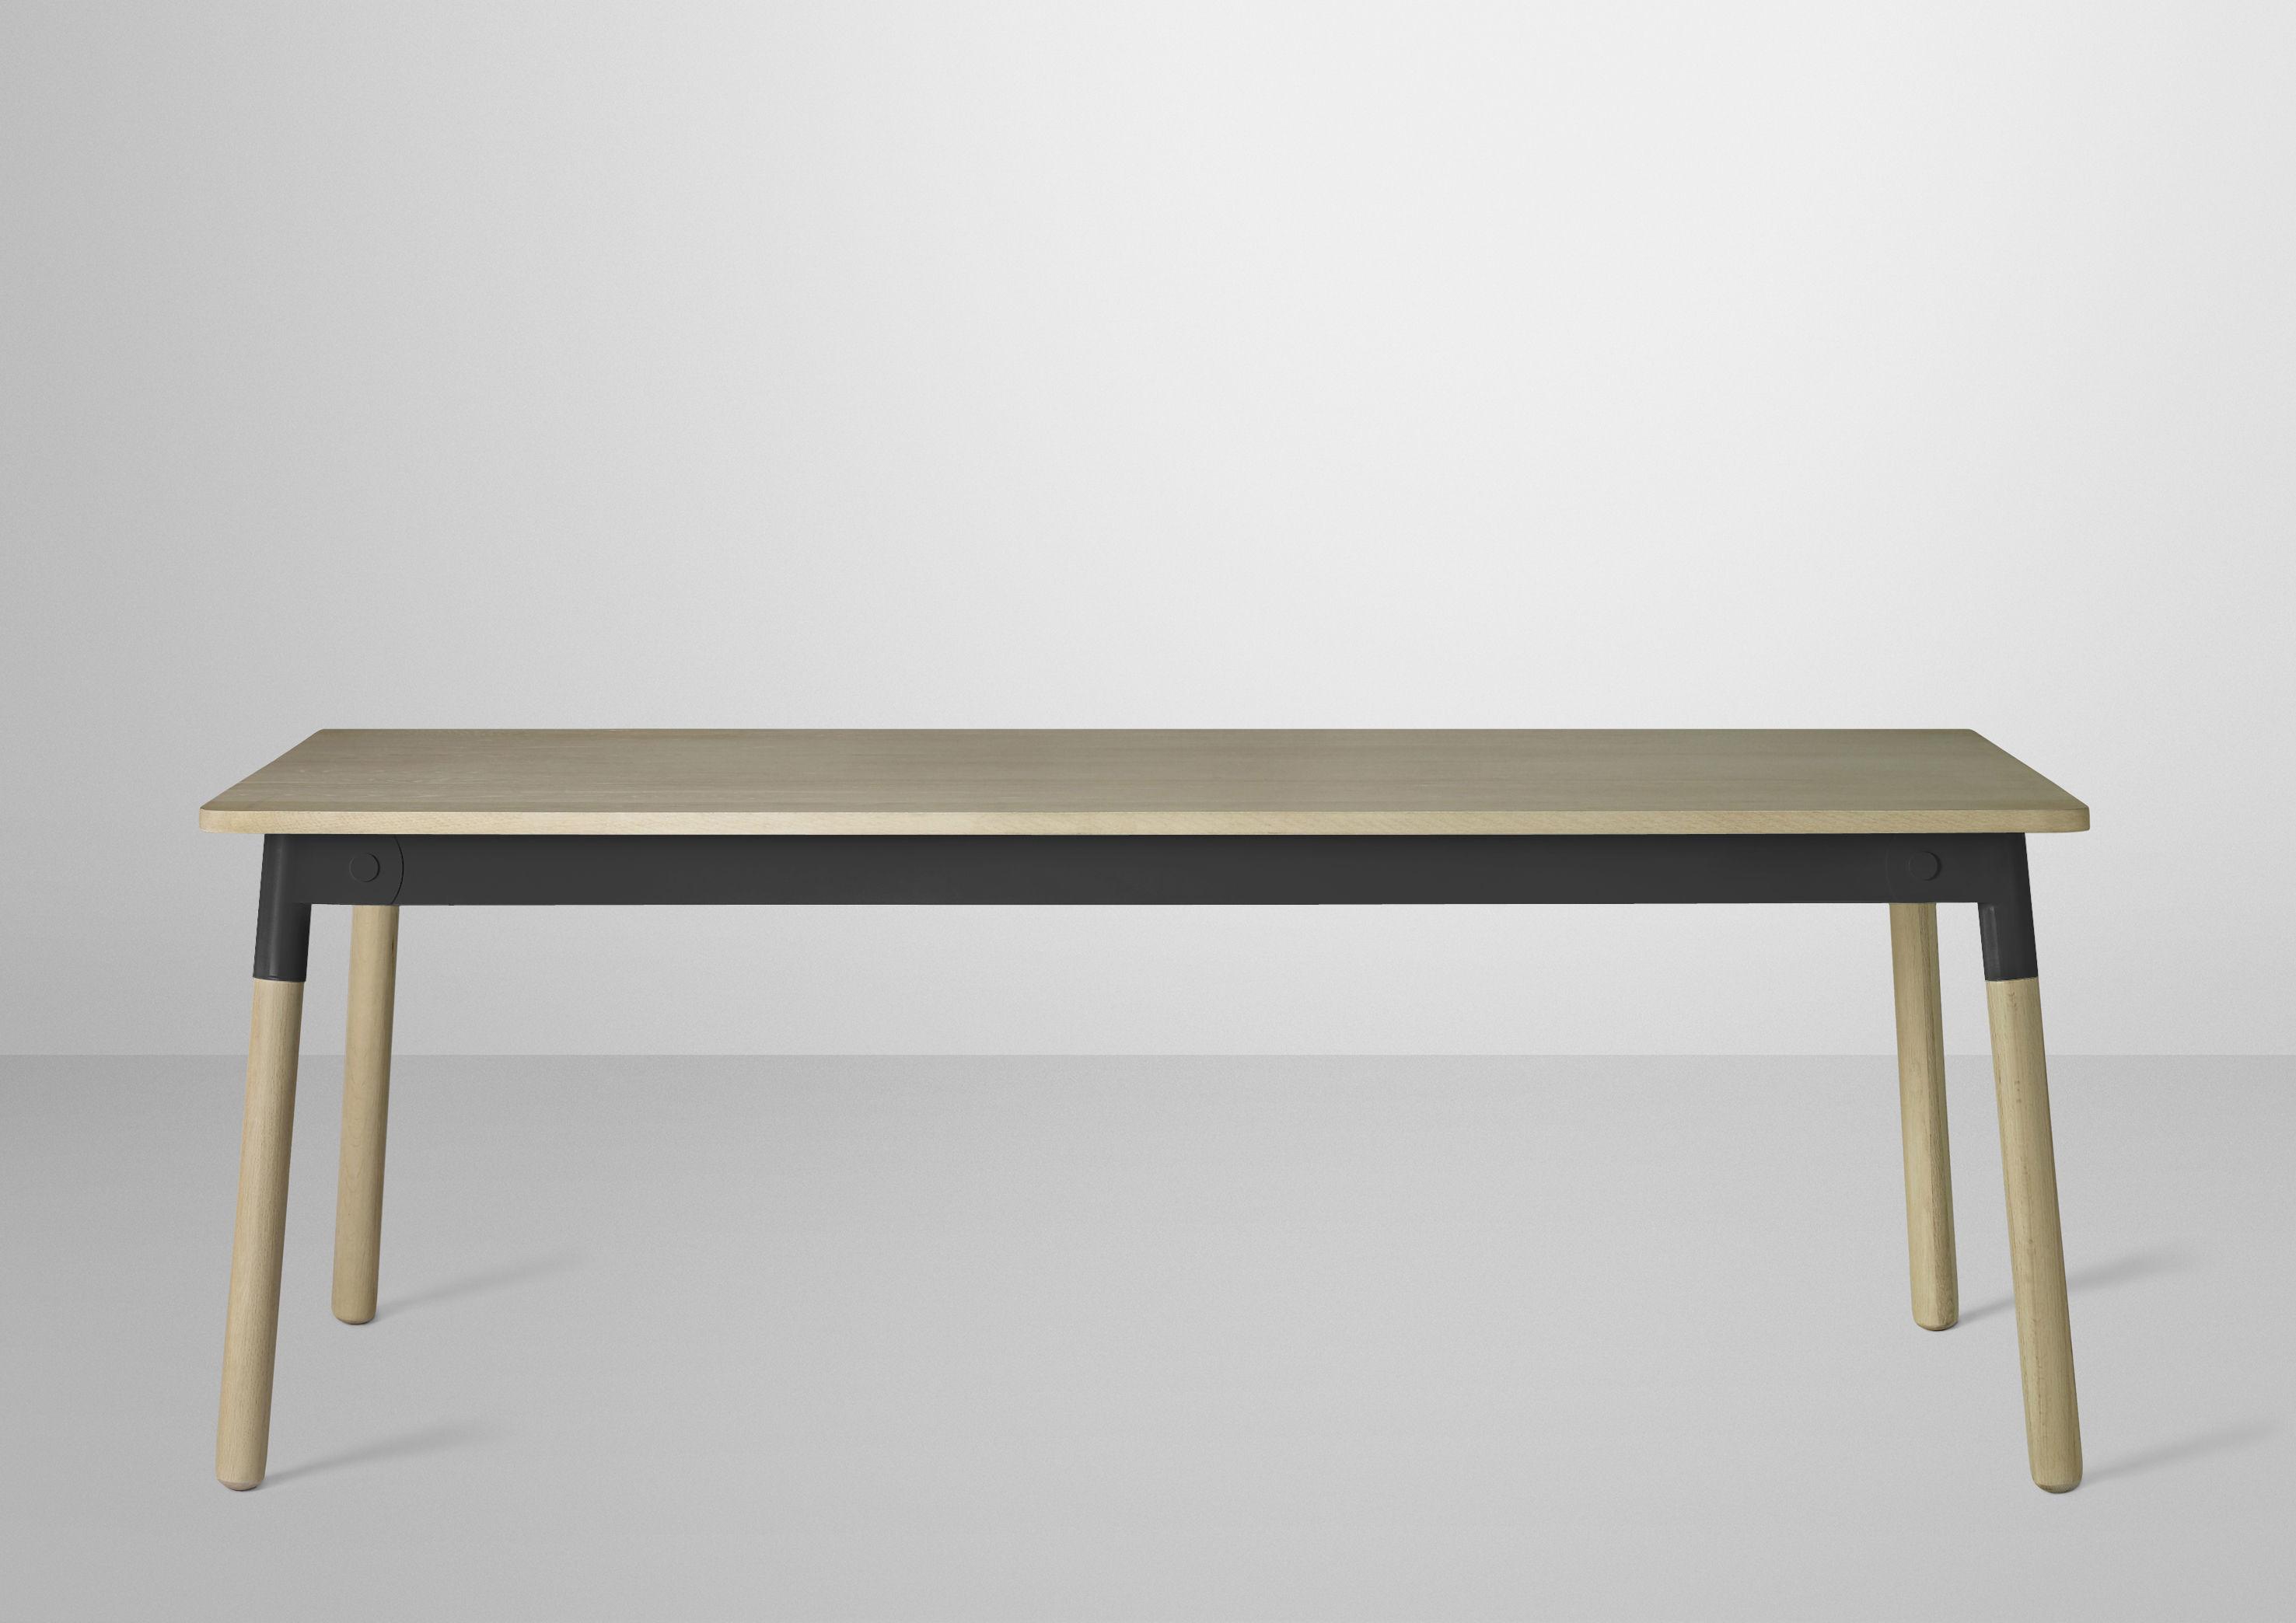 muuto variante aus holz muuto tisch. Black Bedroom Furniture Sets. Home Design Ideas